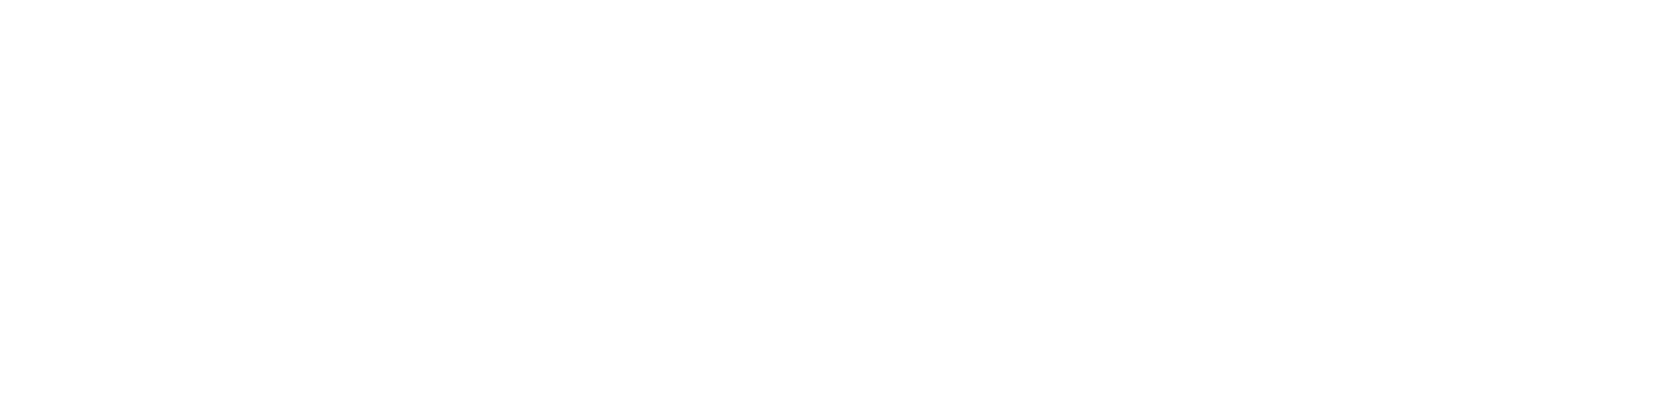 Winpaq logo_White-01 - Copy